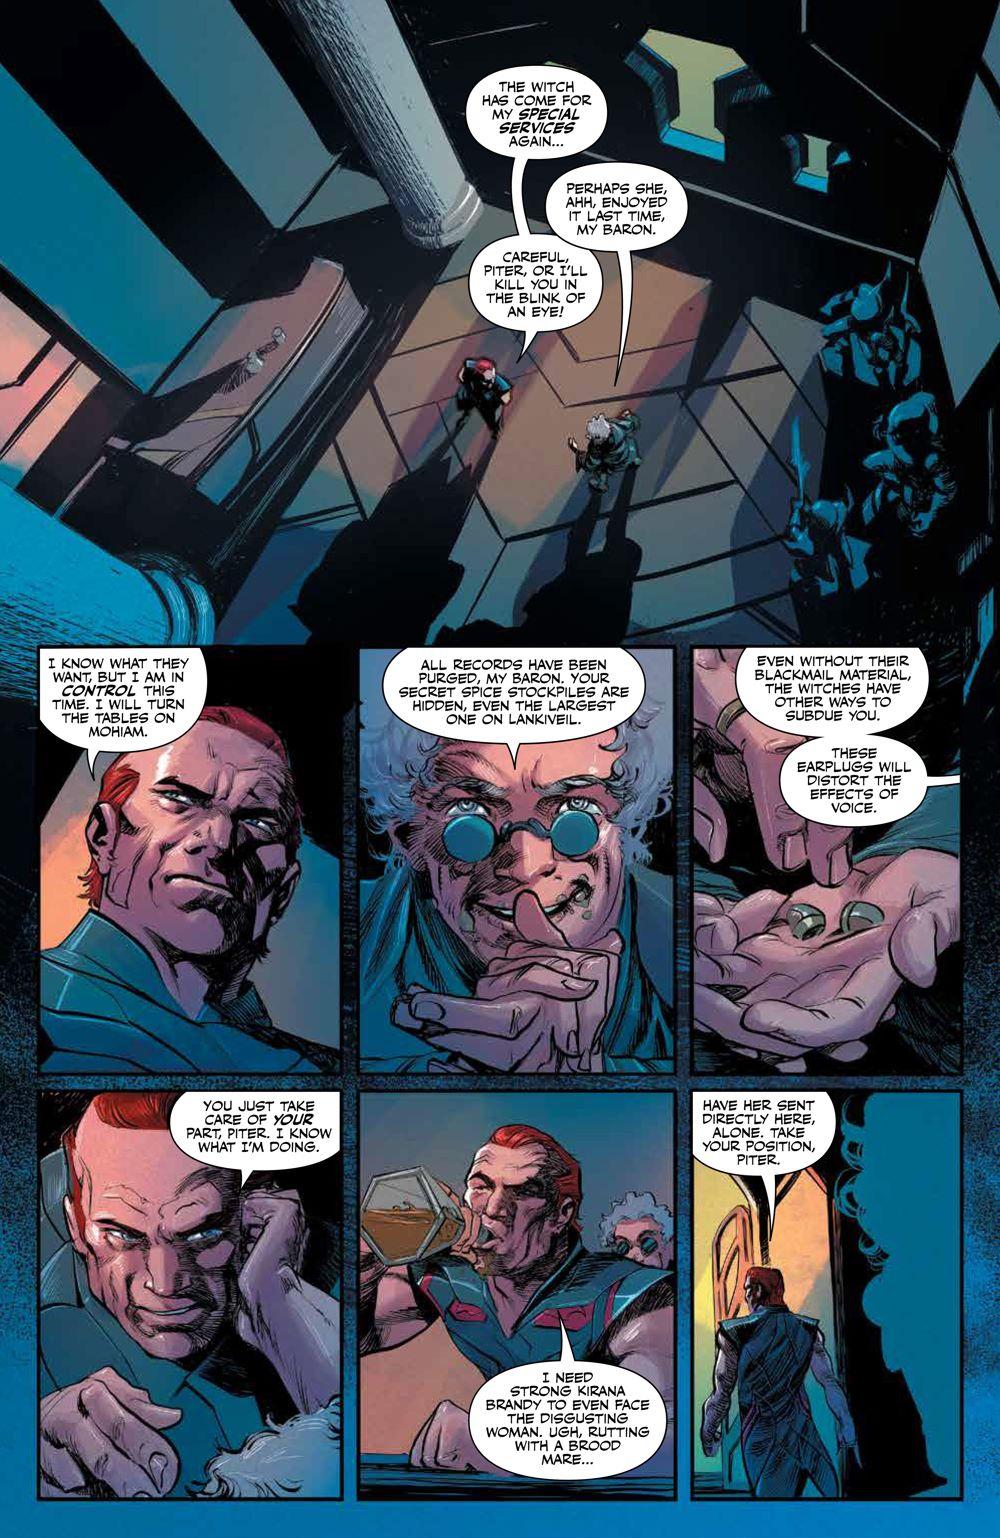 Dune_HouseAtreides_007_PRESS_7 ComicList Previews: DUNE HOUSE ATREIDES #7 (OF 12)